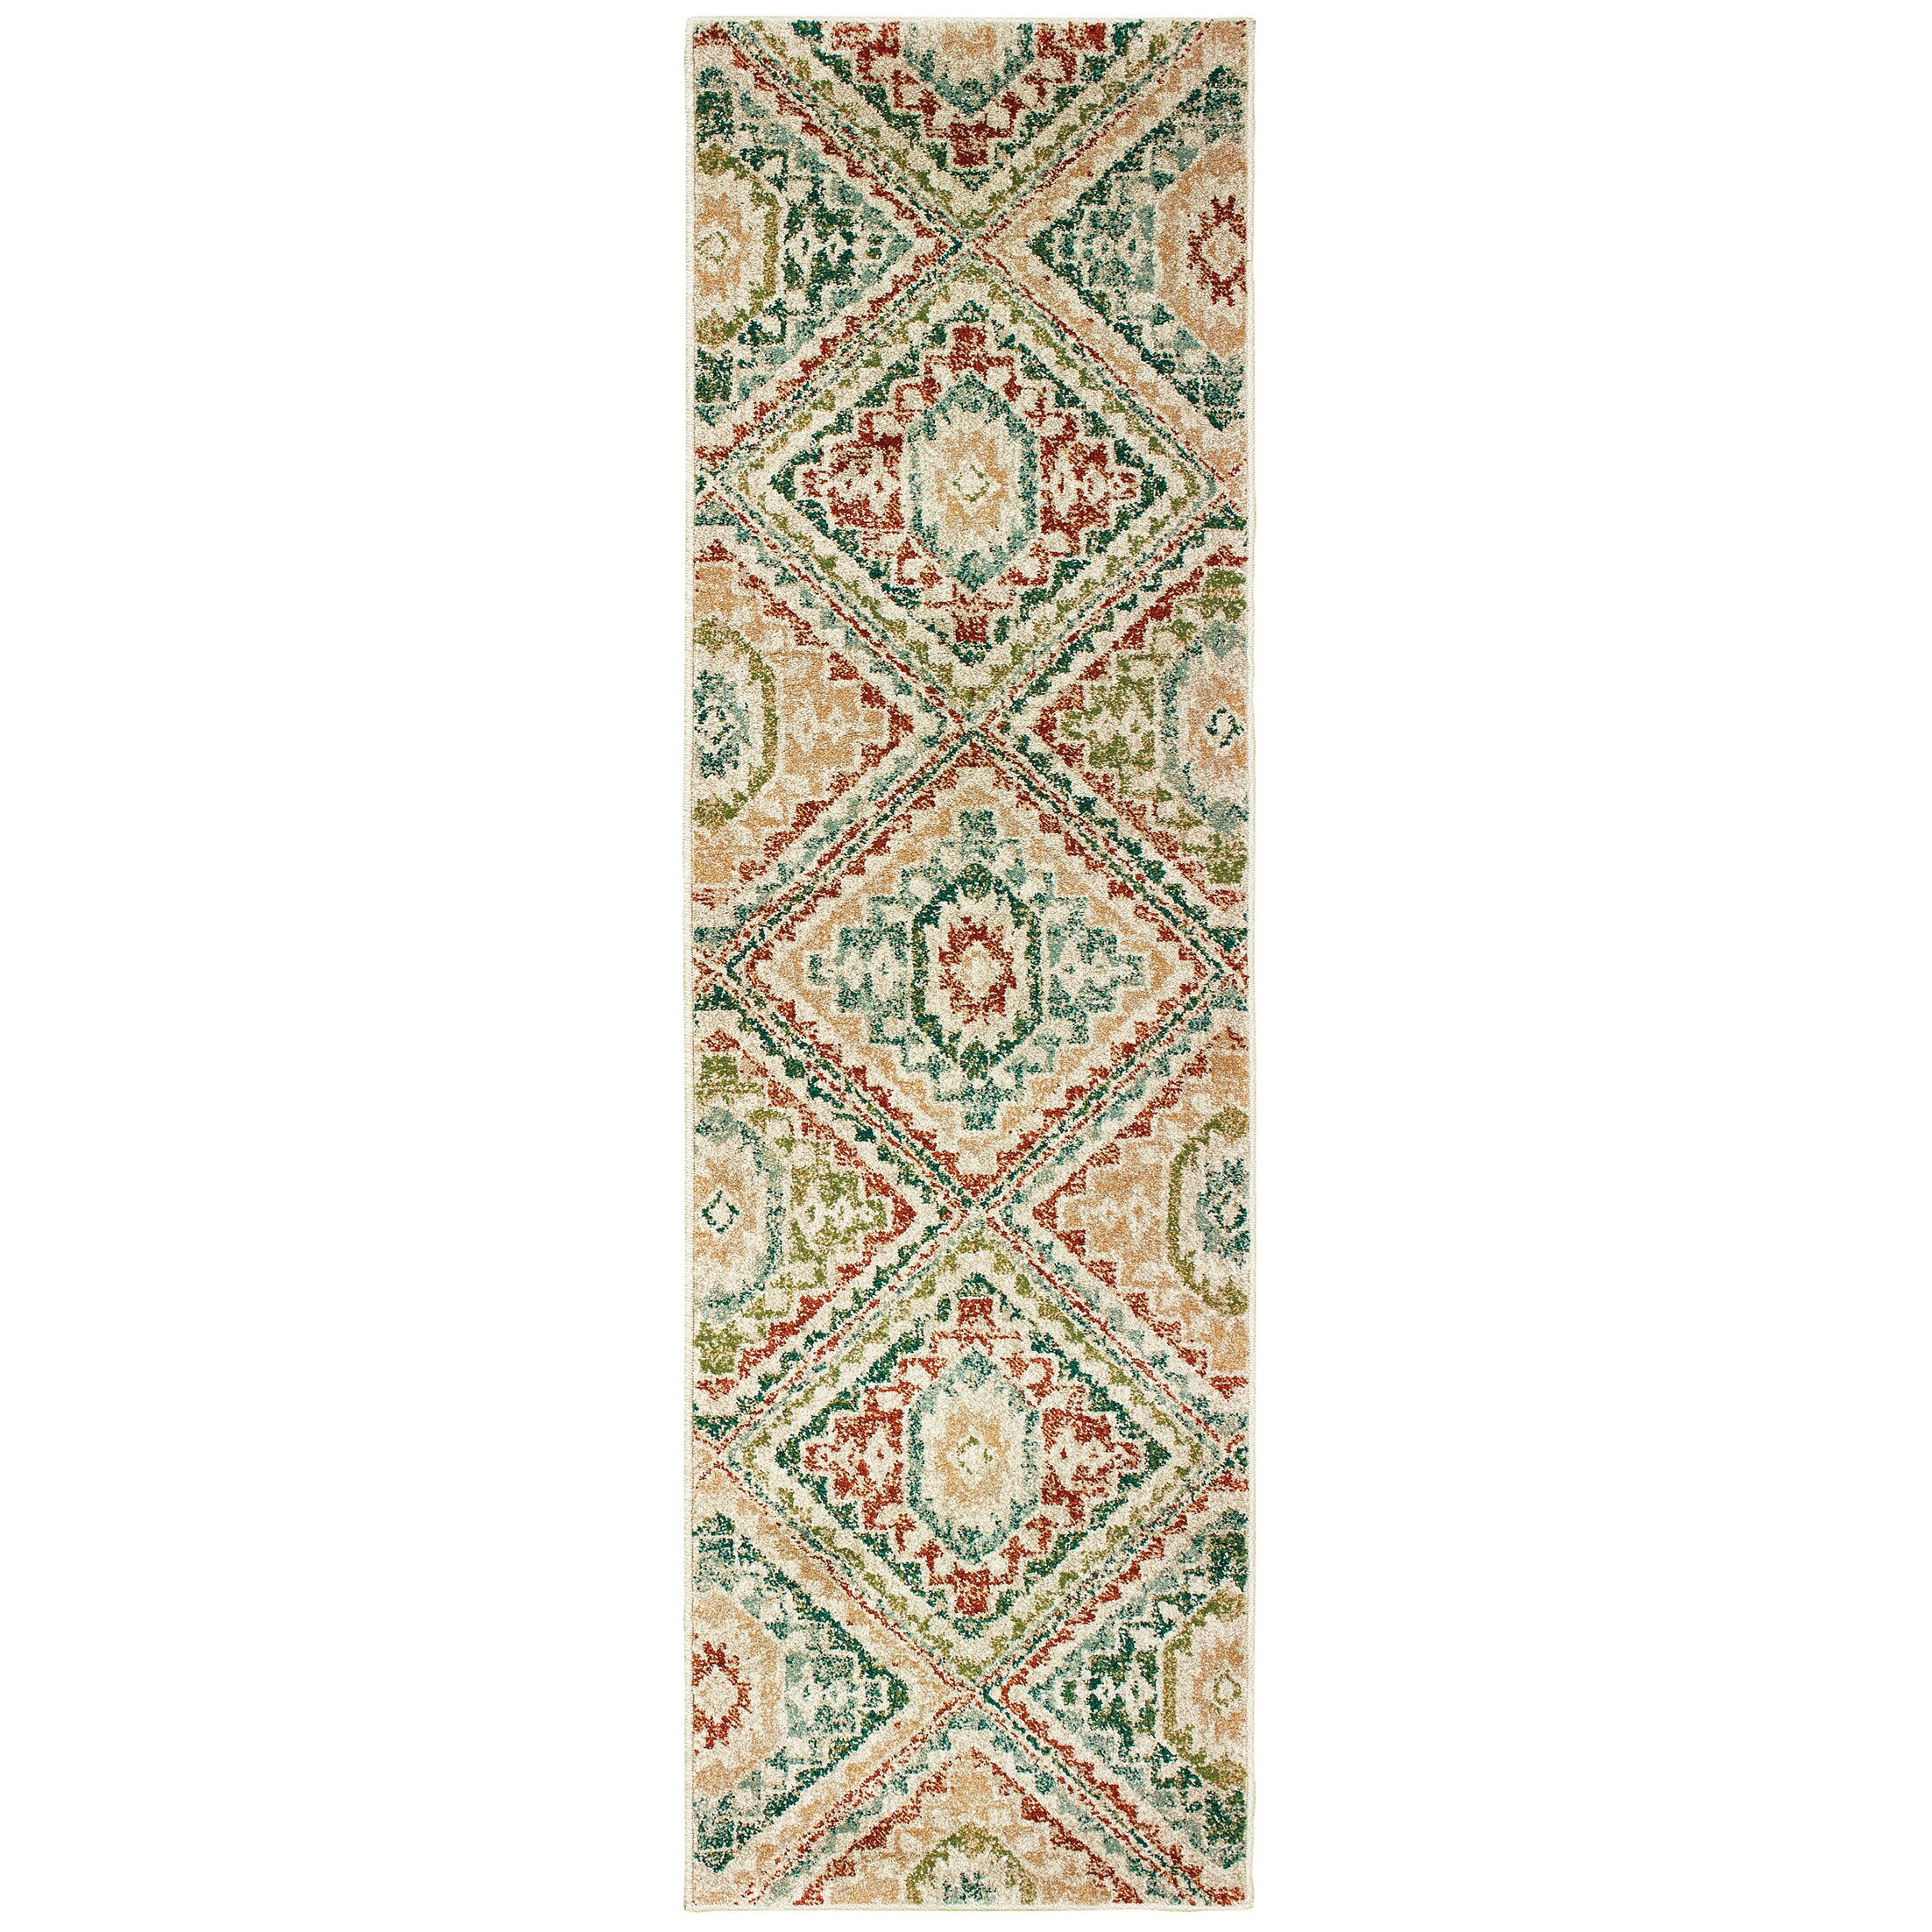 Hedberg Tribal Ivory/Green Area Rug Rug Size: Rectangle 9'10